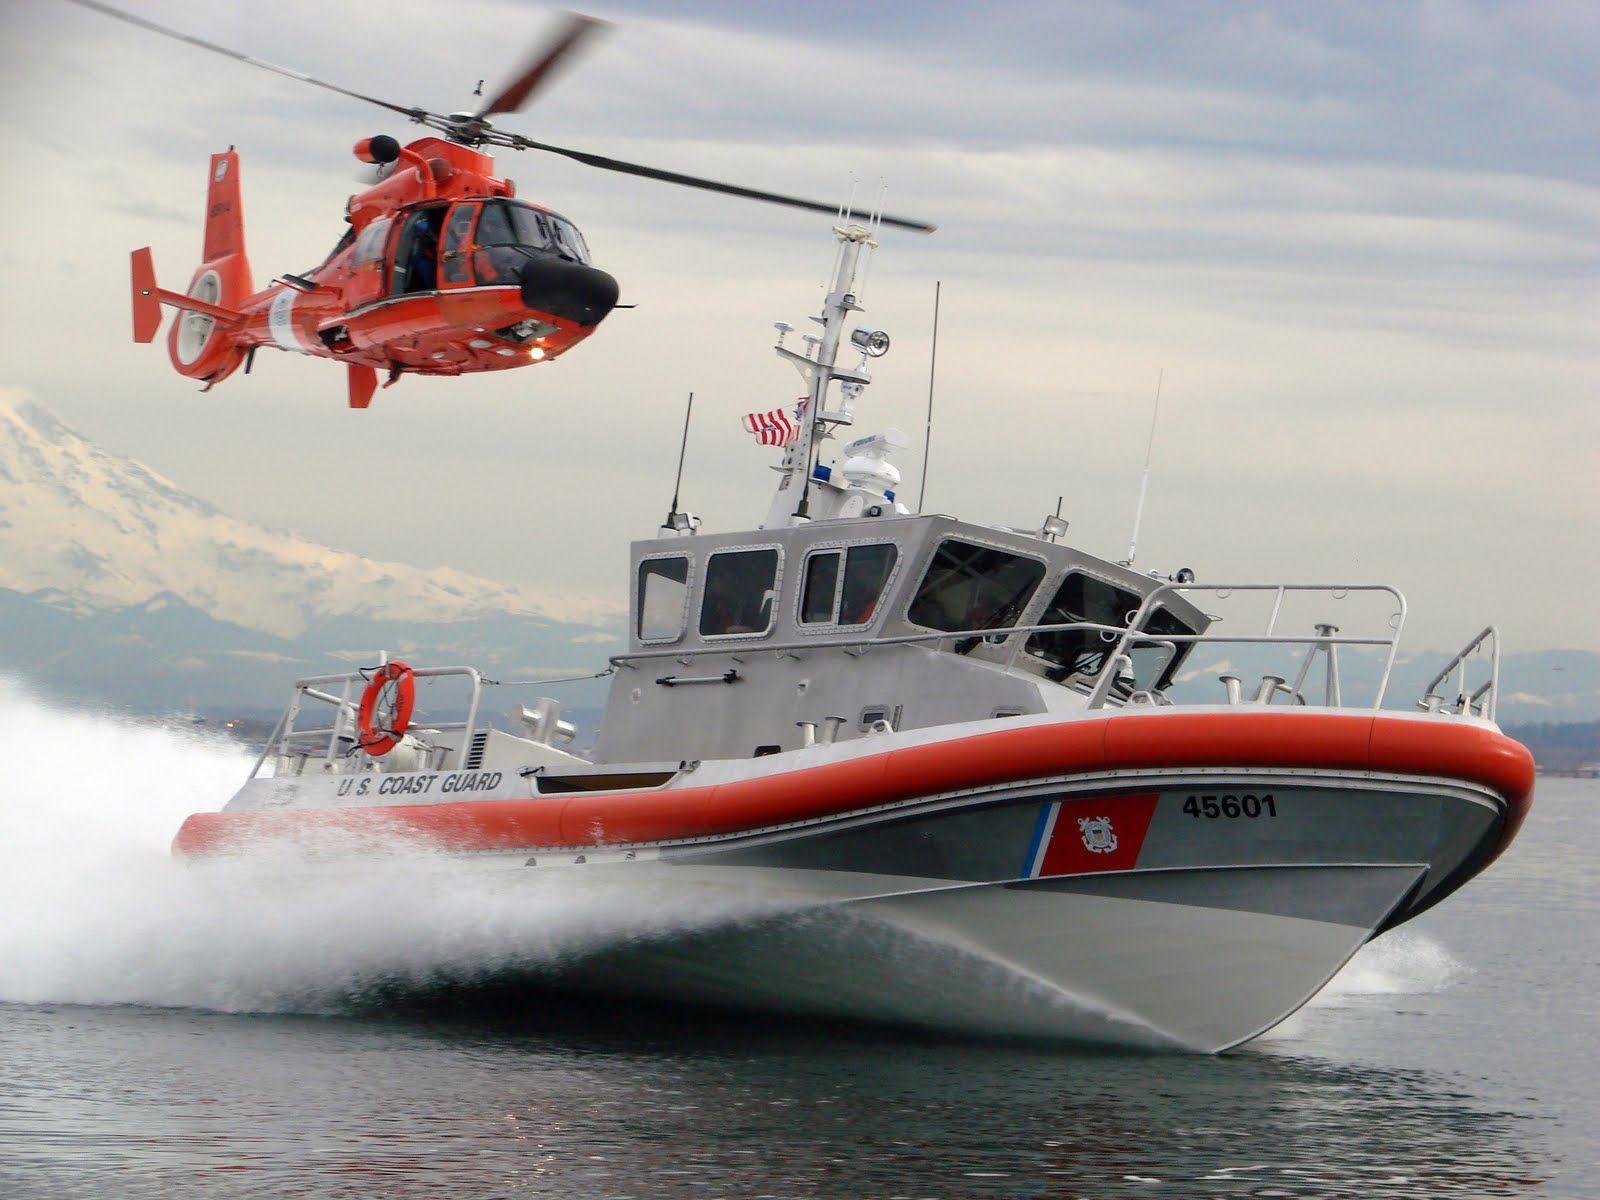 United States Coast Guard Auxiliary Gig Harbor Meeting